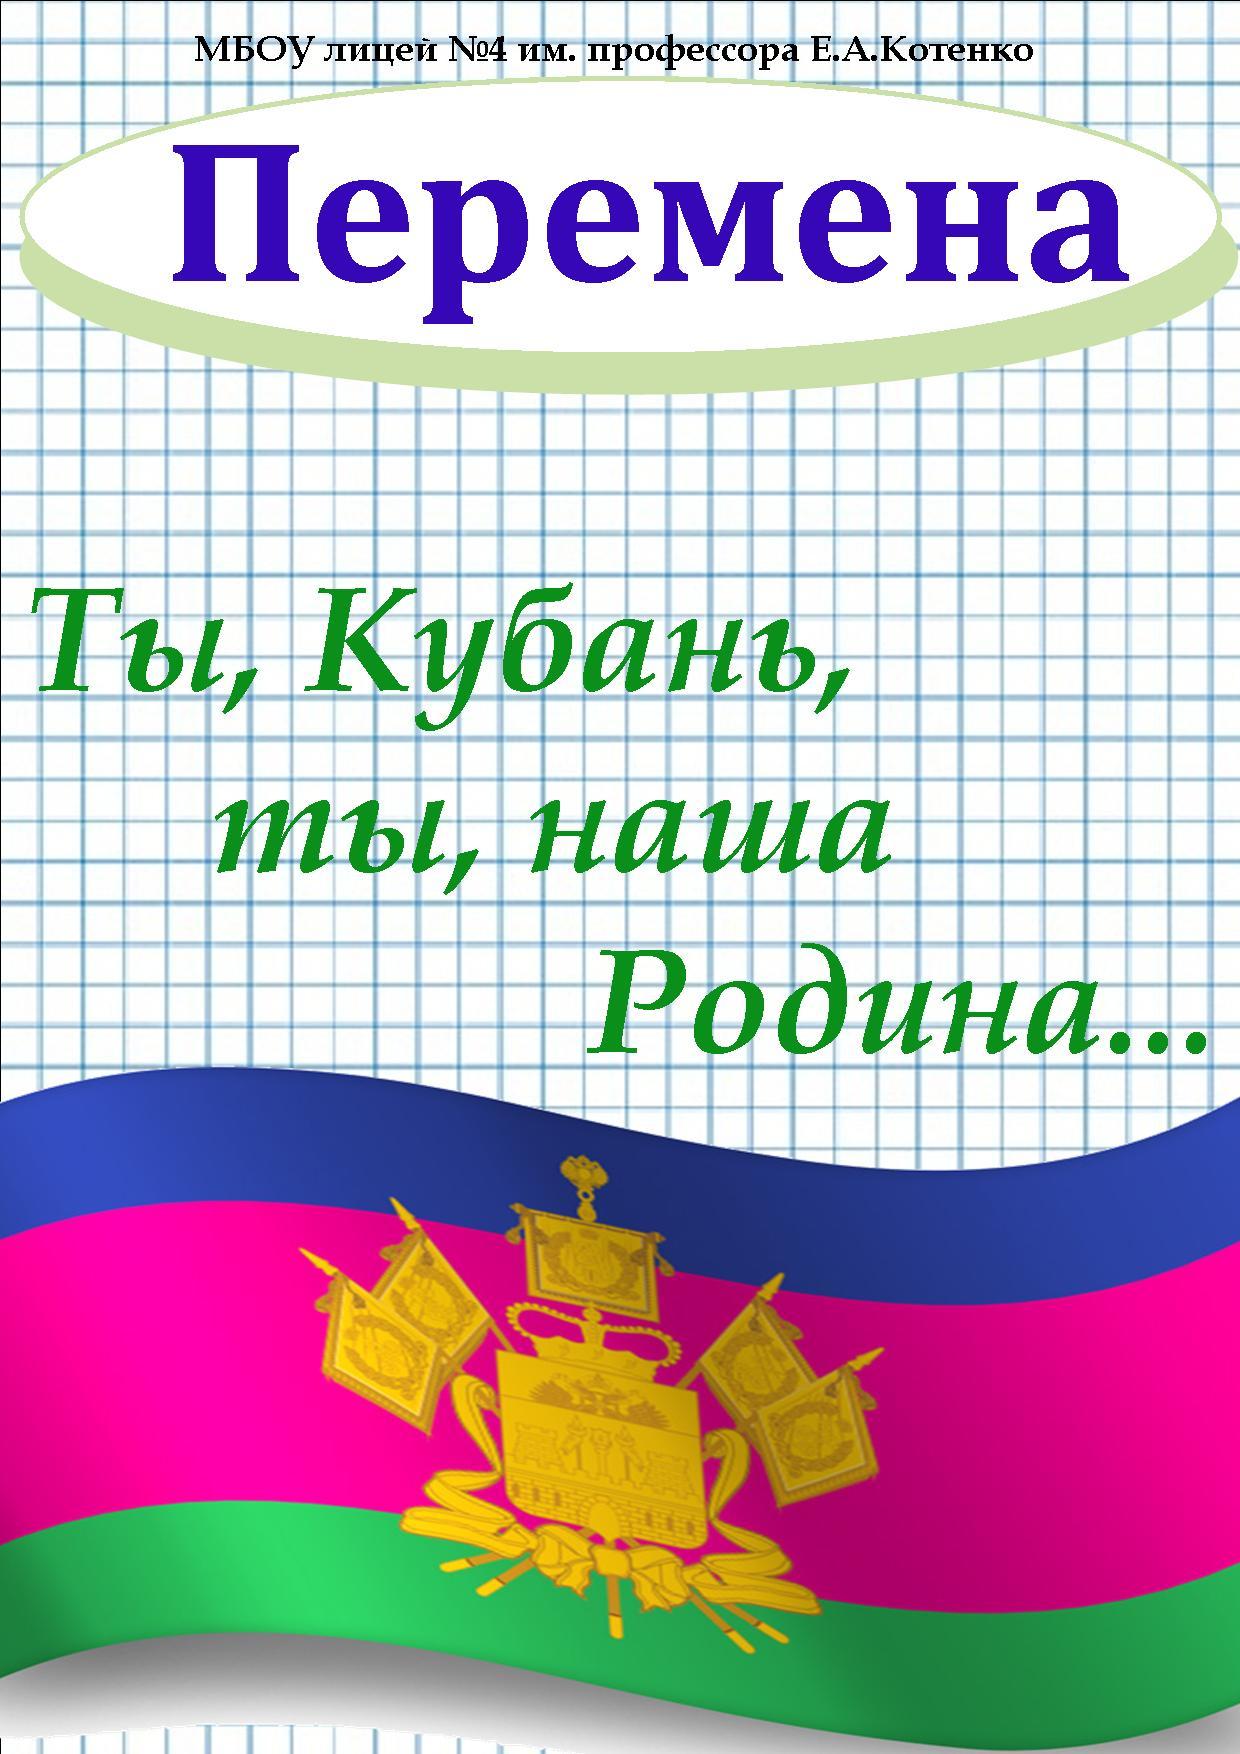 osnovanie-kk-2016-1